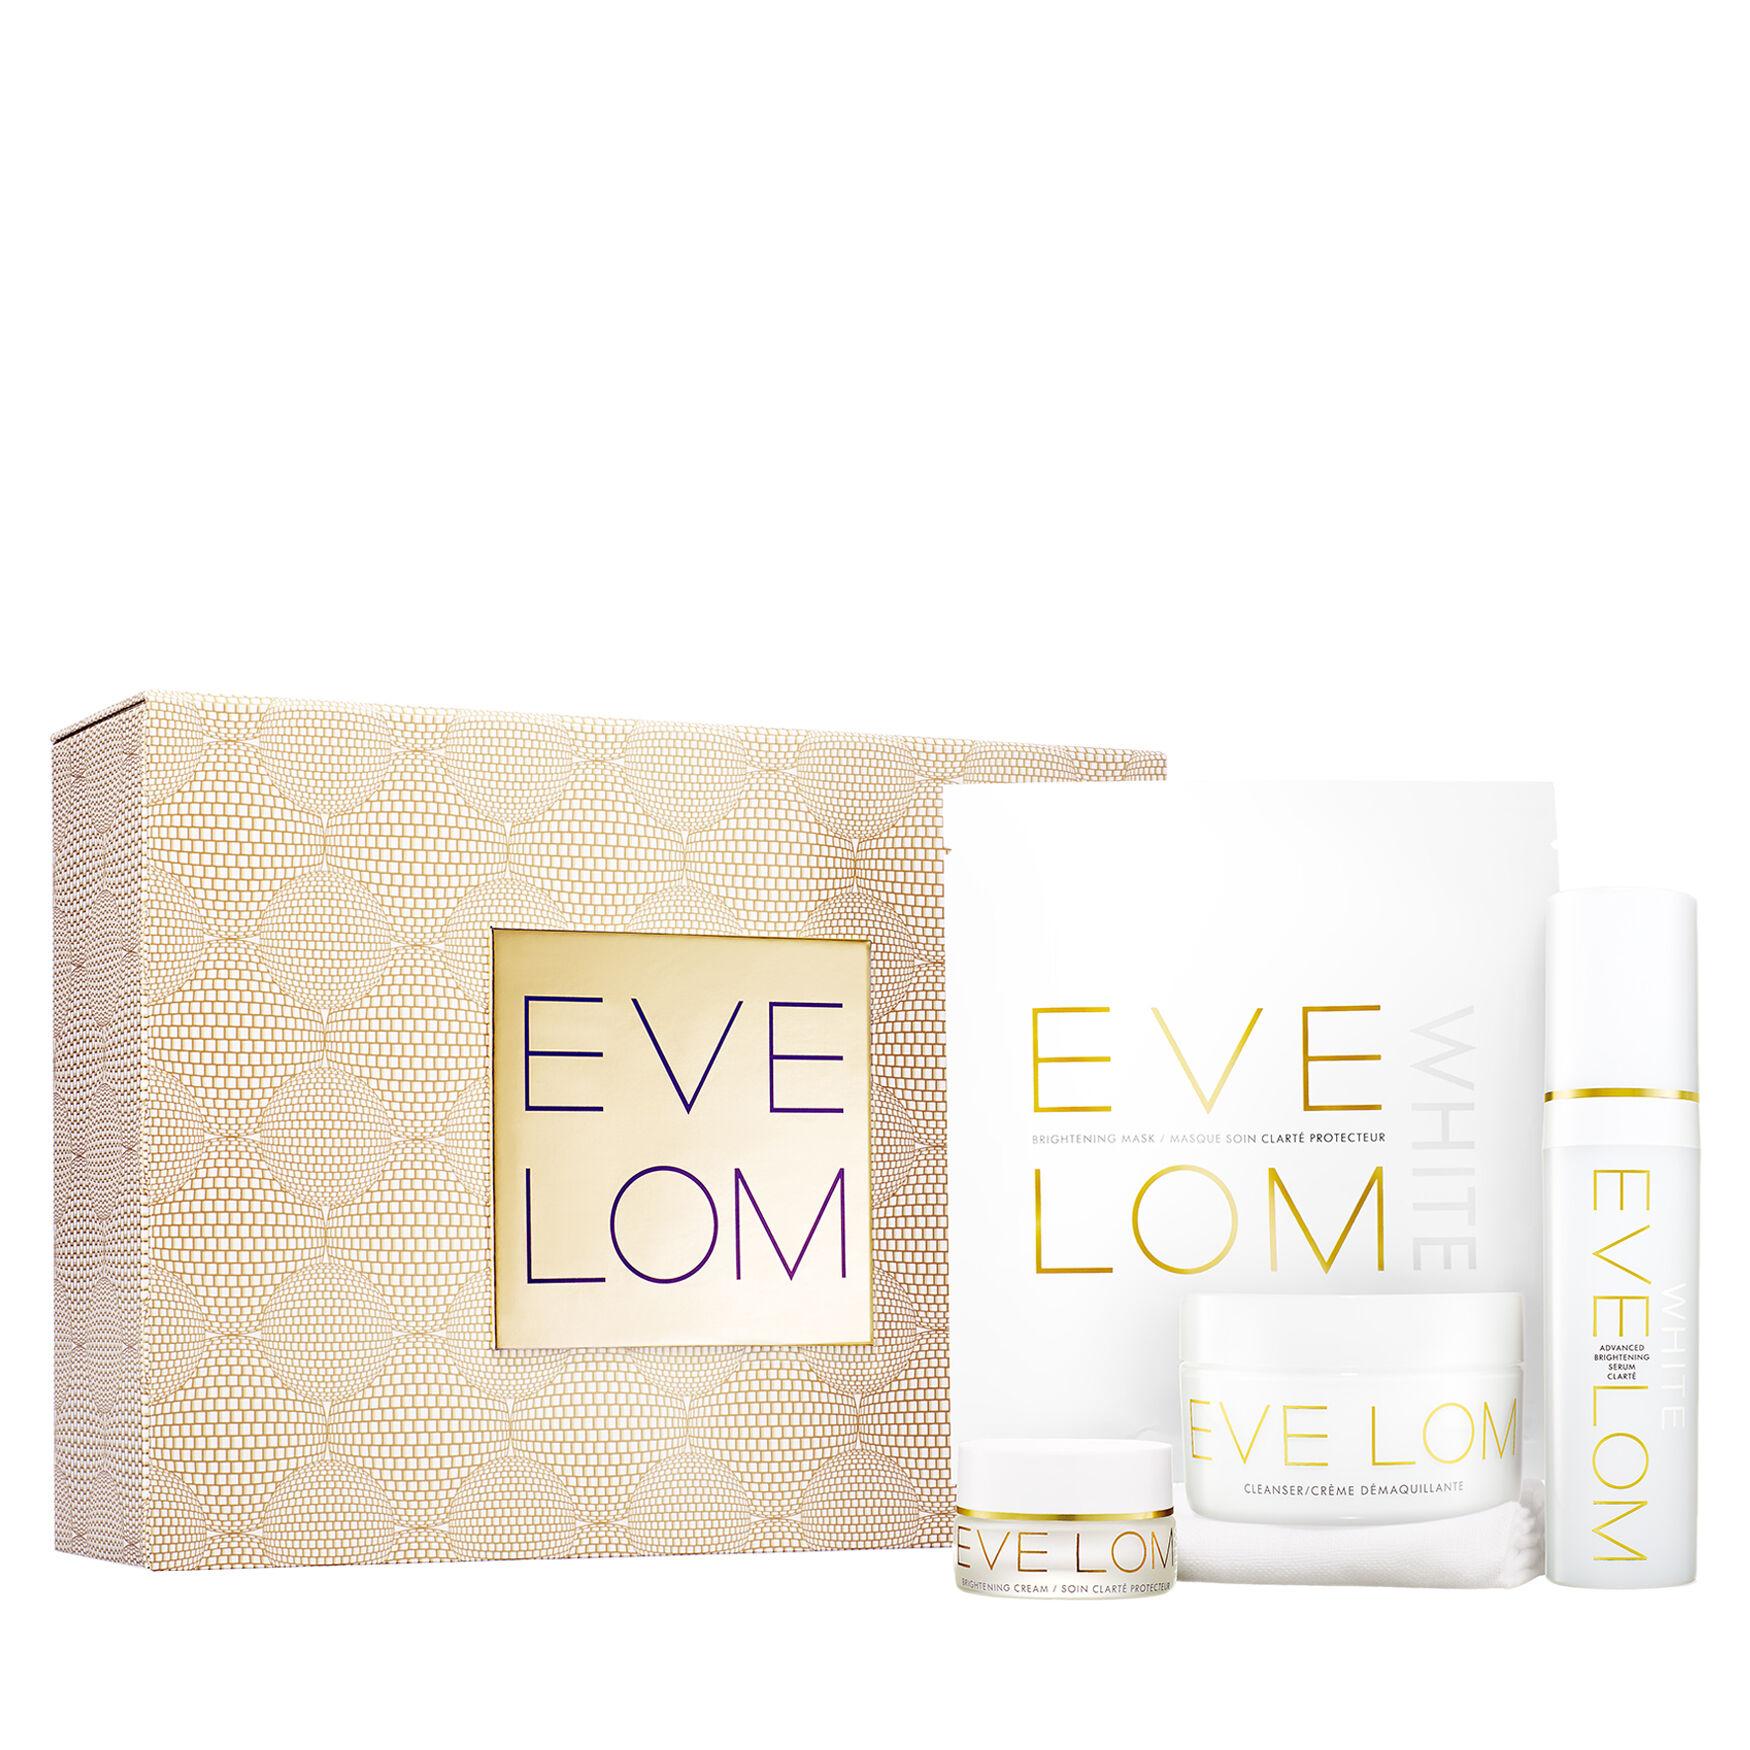 Eve Lom Perfecting Ritual 4-Piece Set jurlique herbal recovery advanced serum - 30ml/1oz